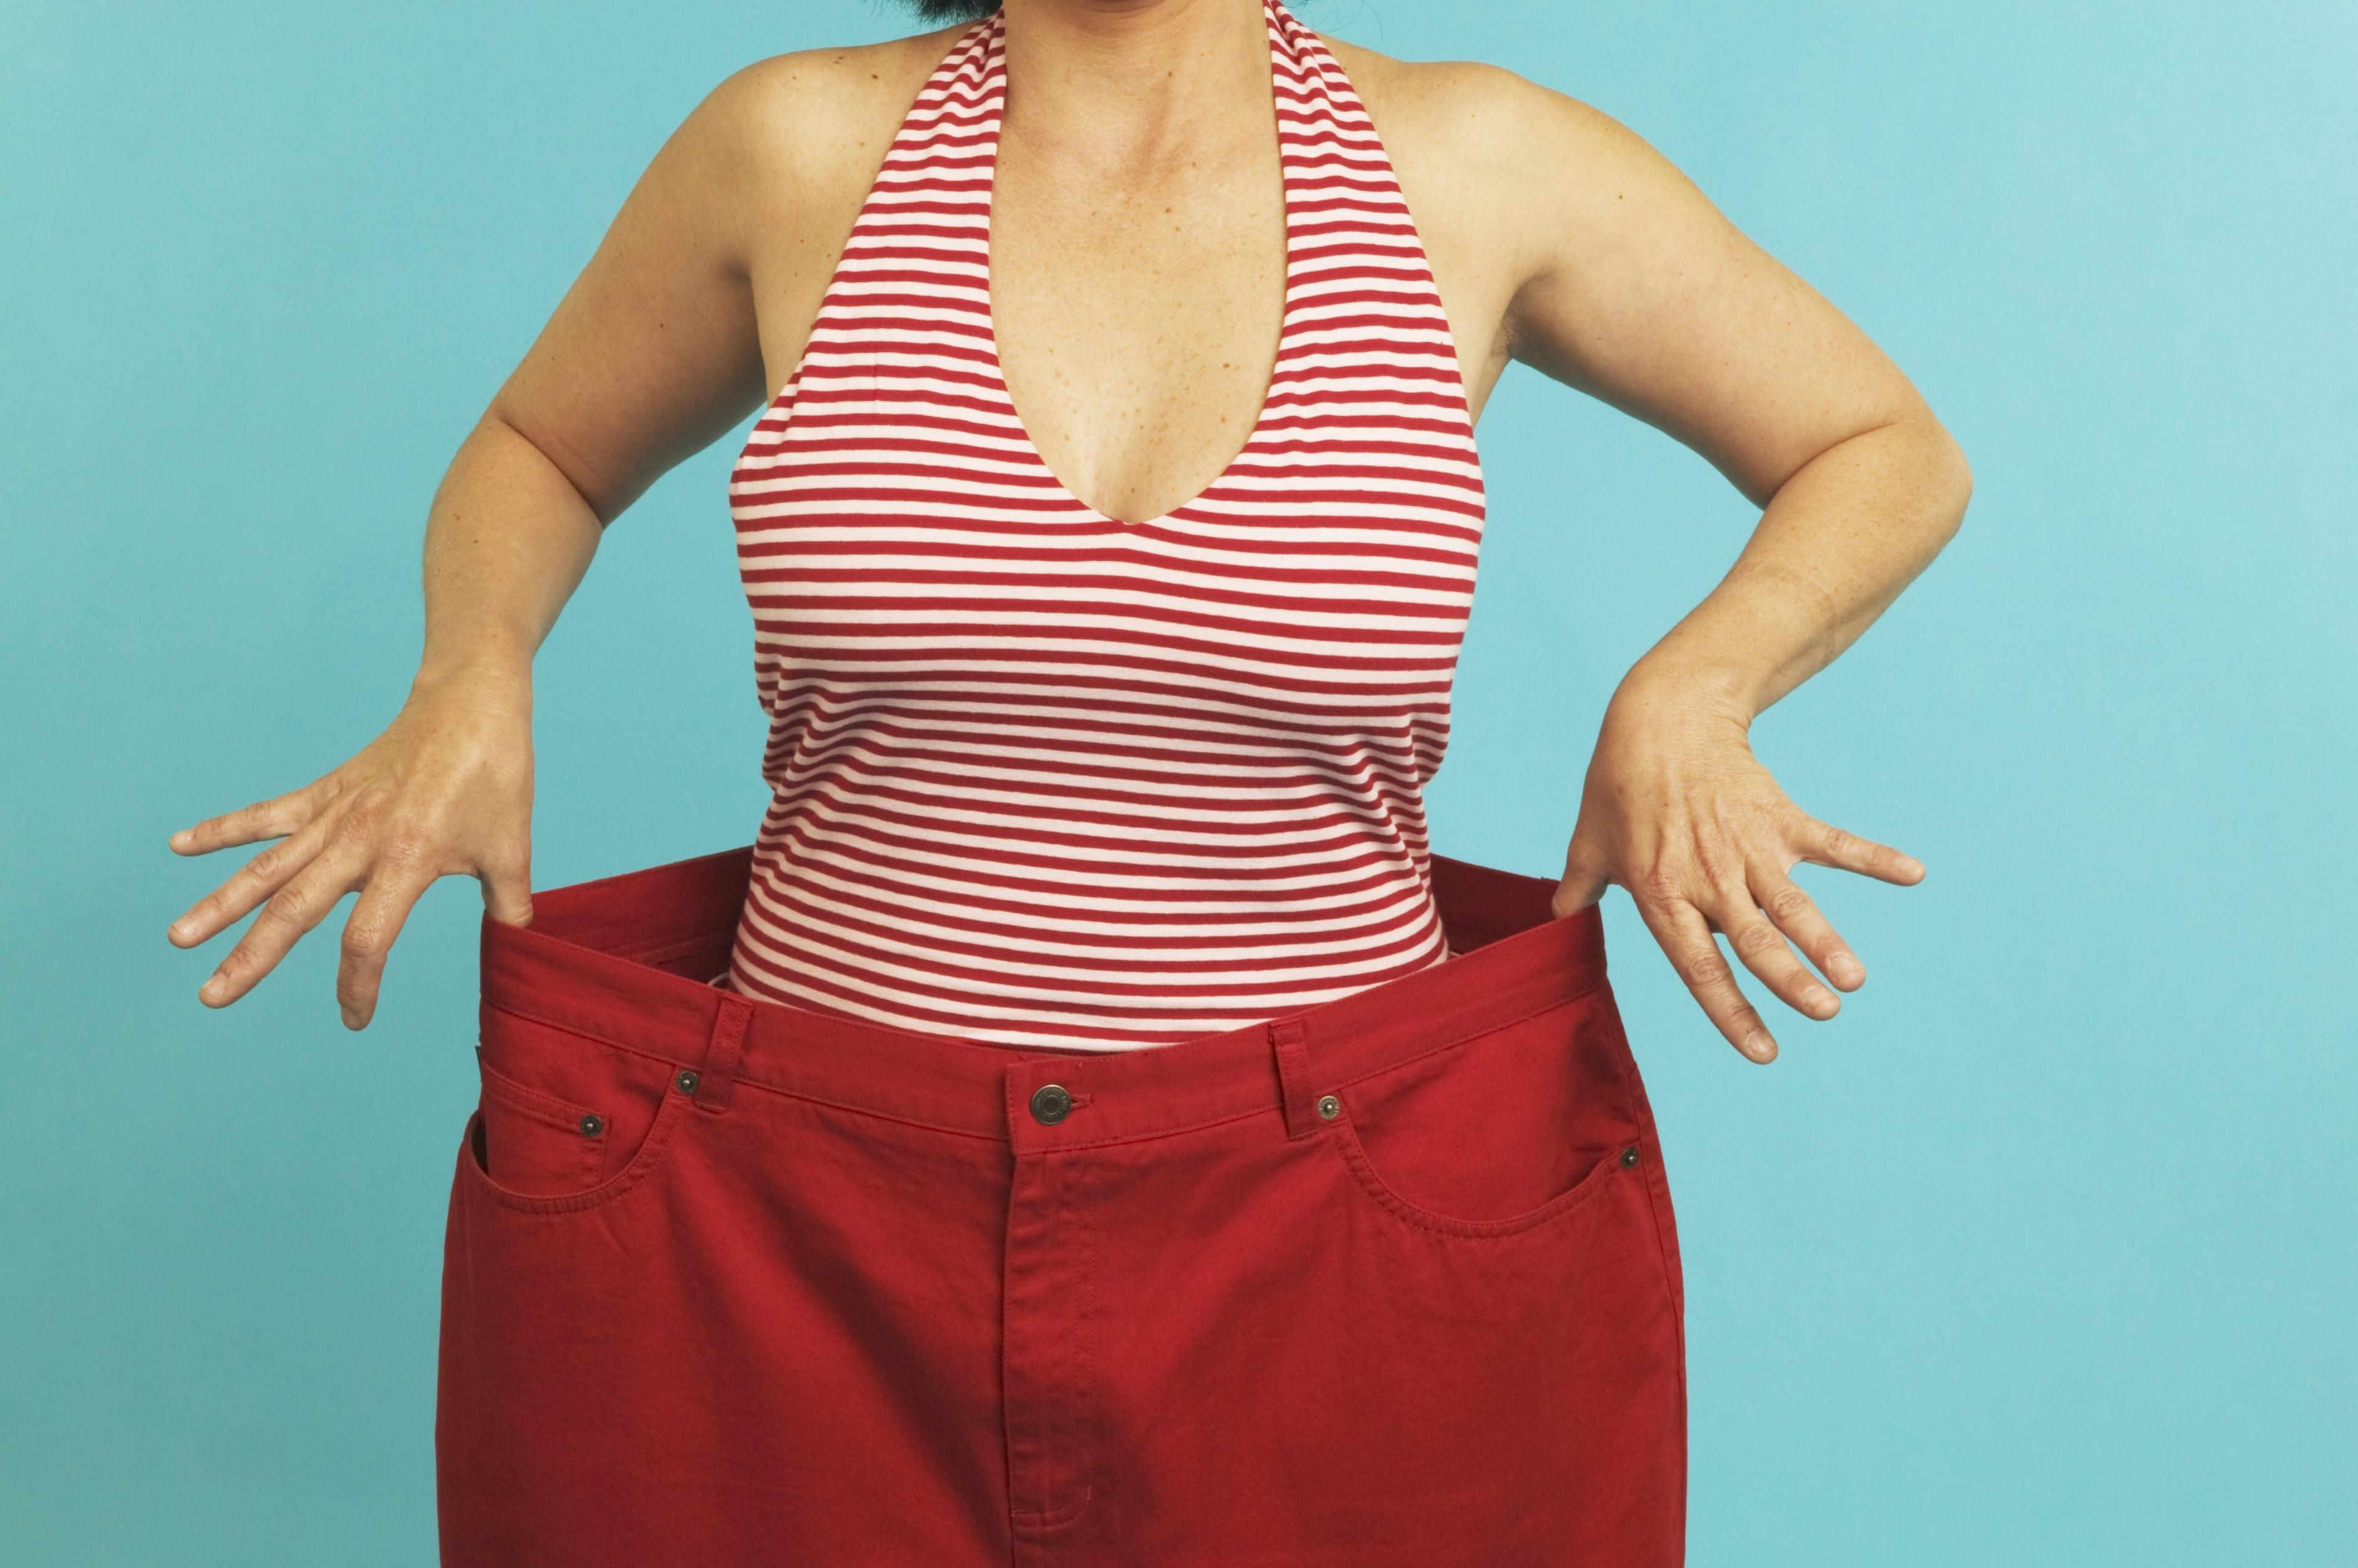 Liposuction vs. Fat Freezing – The Pros & Cons